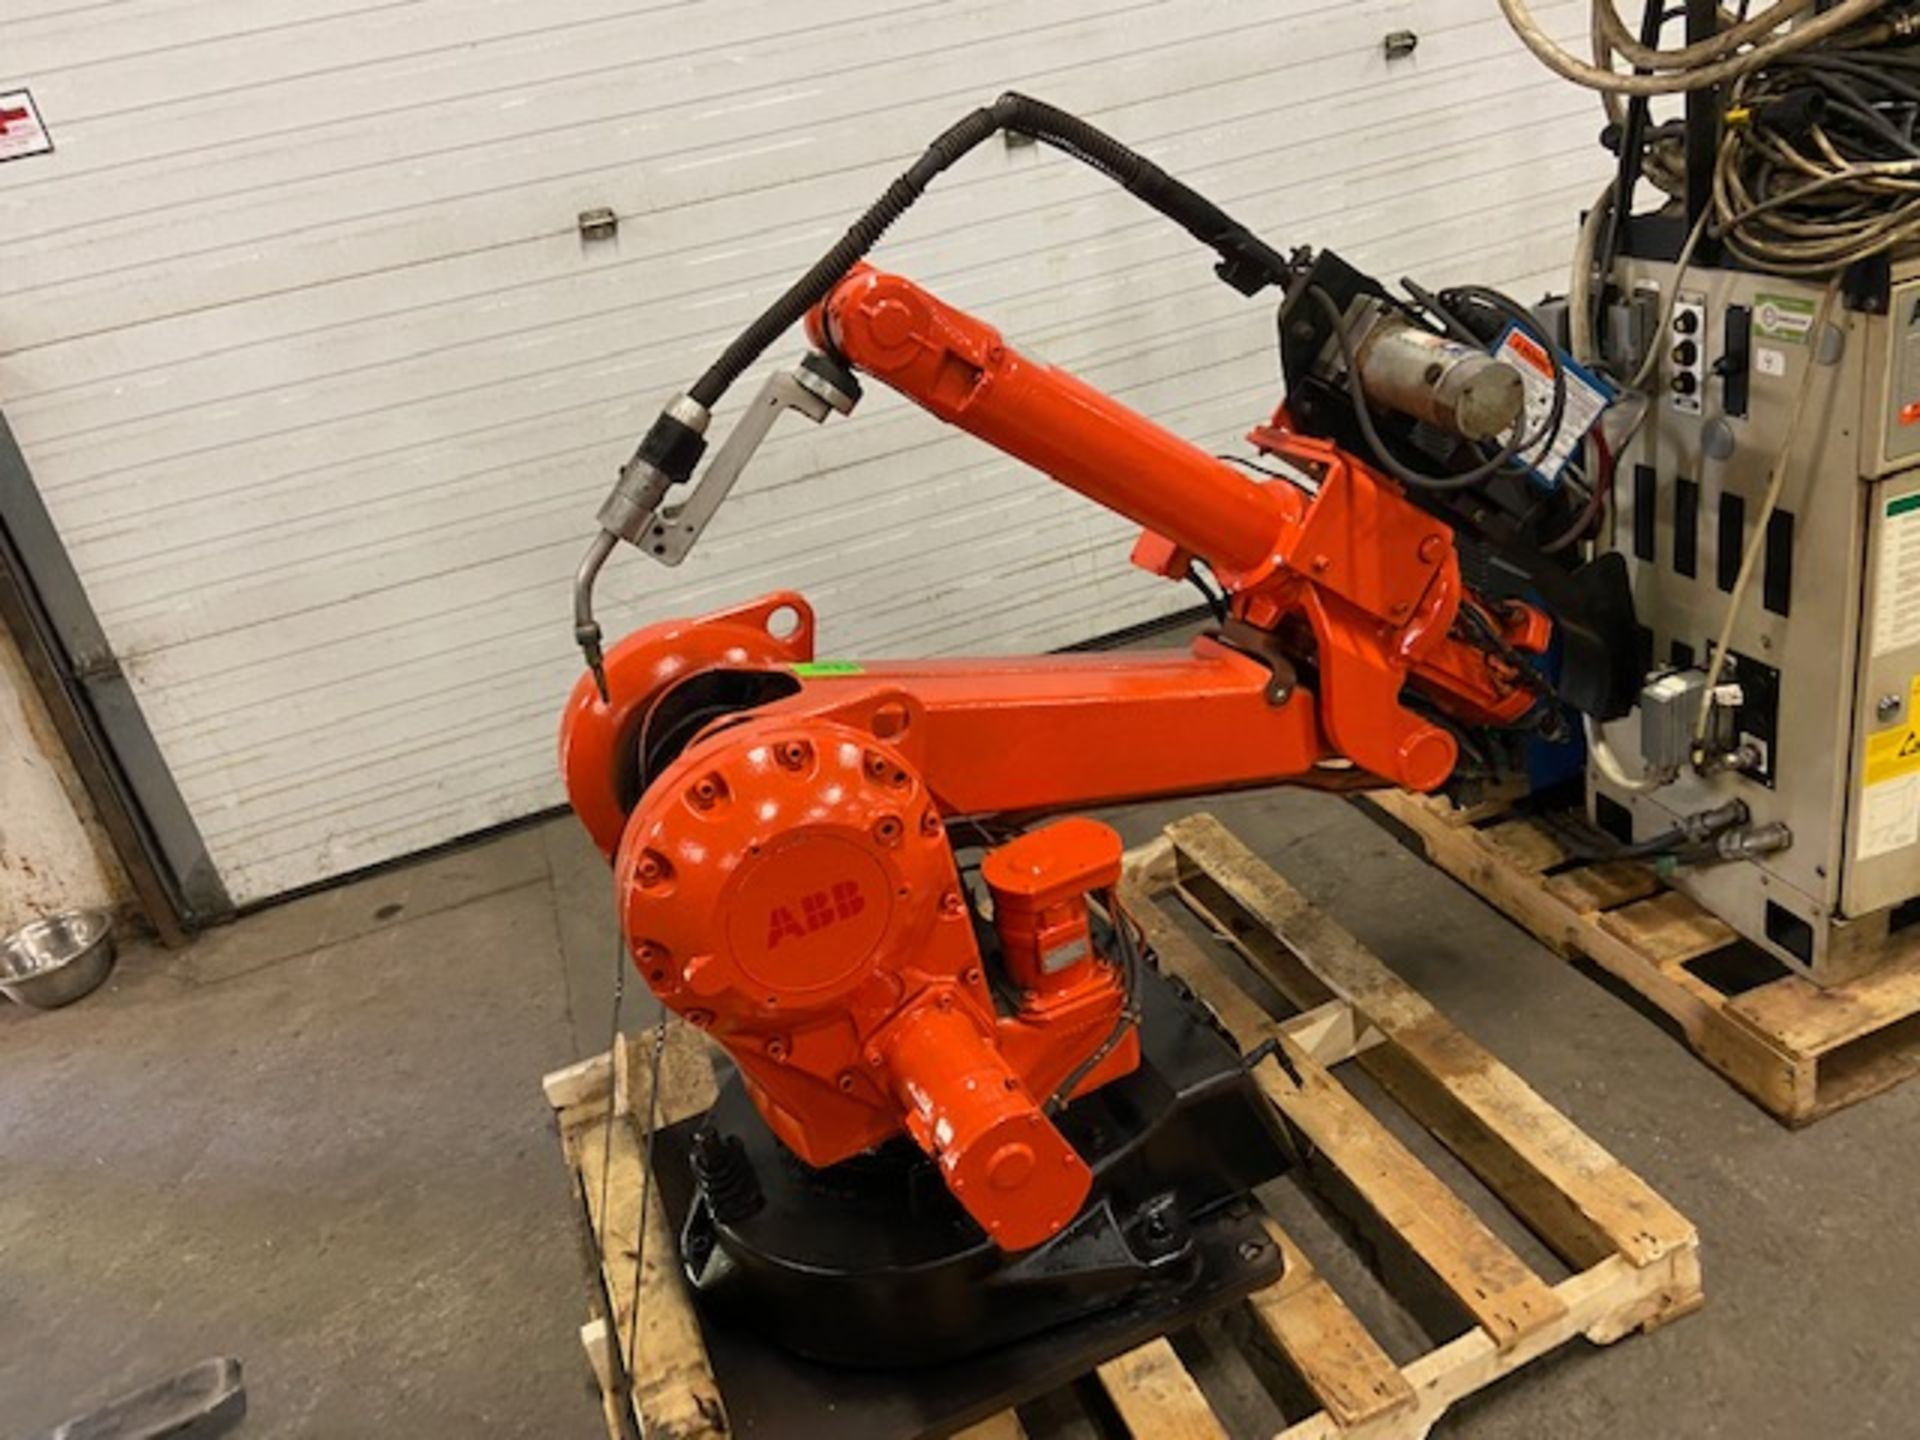 2004 ABB Robot IRB 2400 Welding Robot M2000 Control with Miller Deltaweld 452 450 Amp Mig Welder - Image 3 of 4